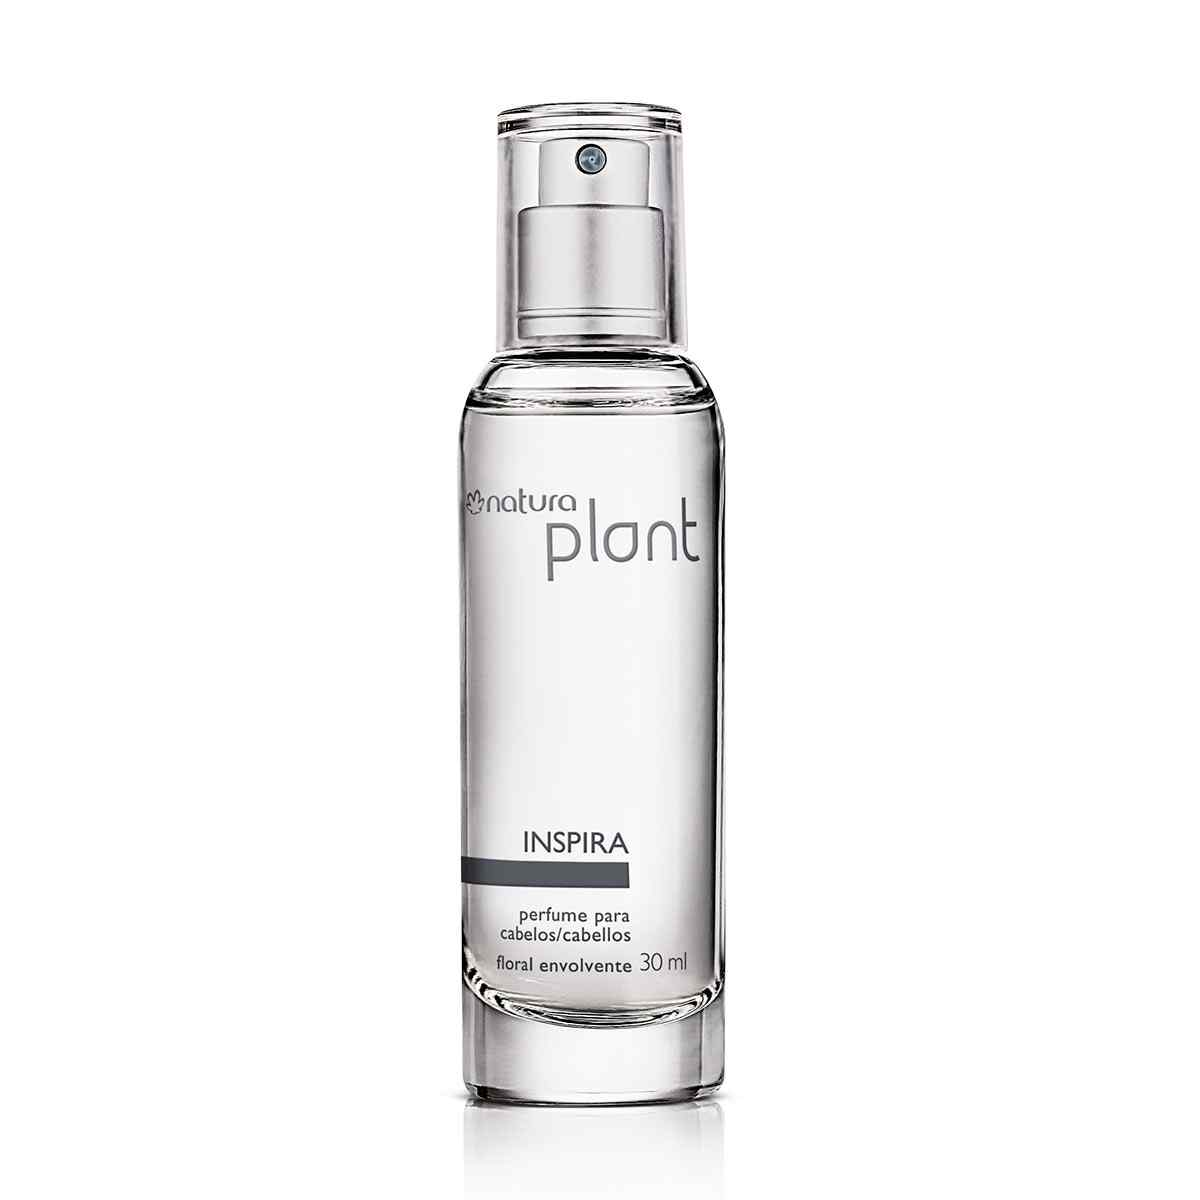 Perfume para Cabelos Plant Inspira - 30ml - 80691